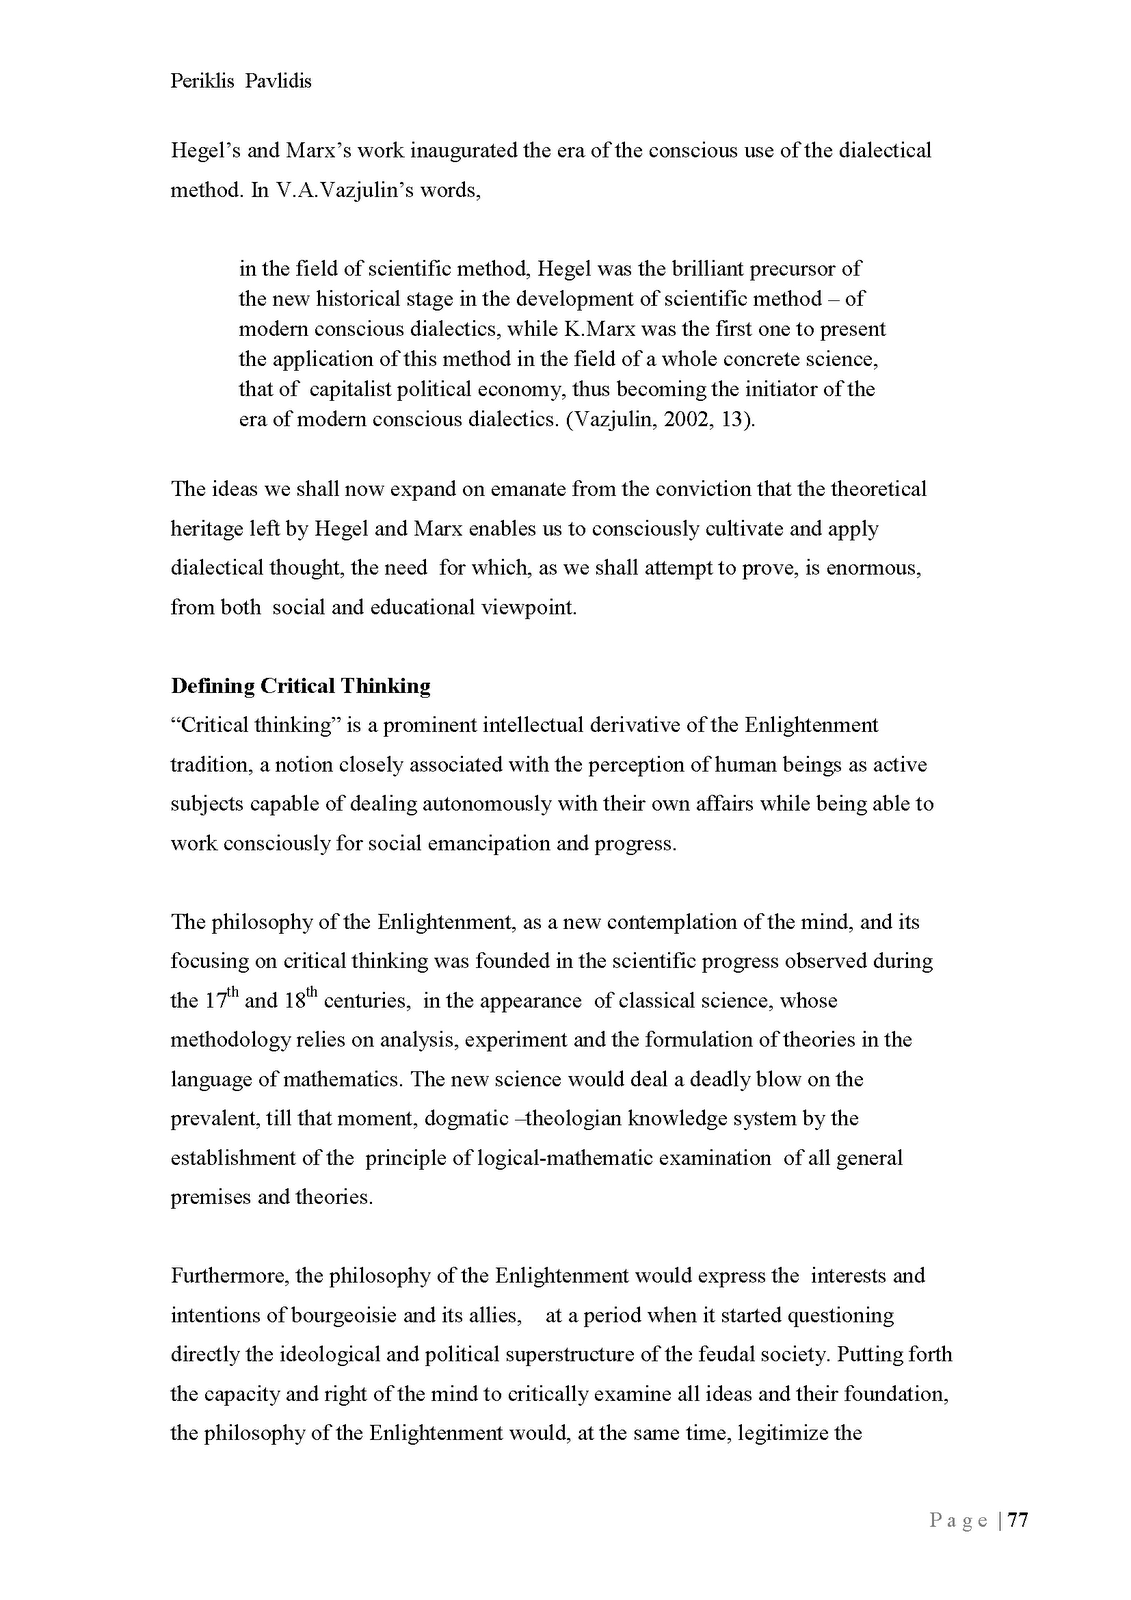 General scientific dialectic method and its development 22